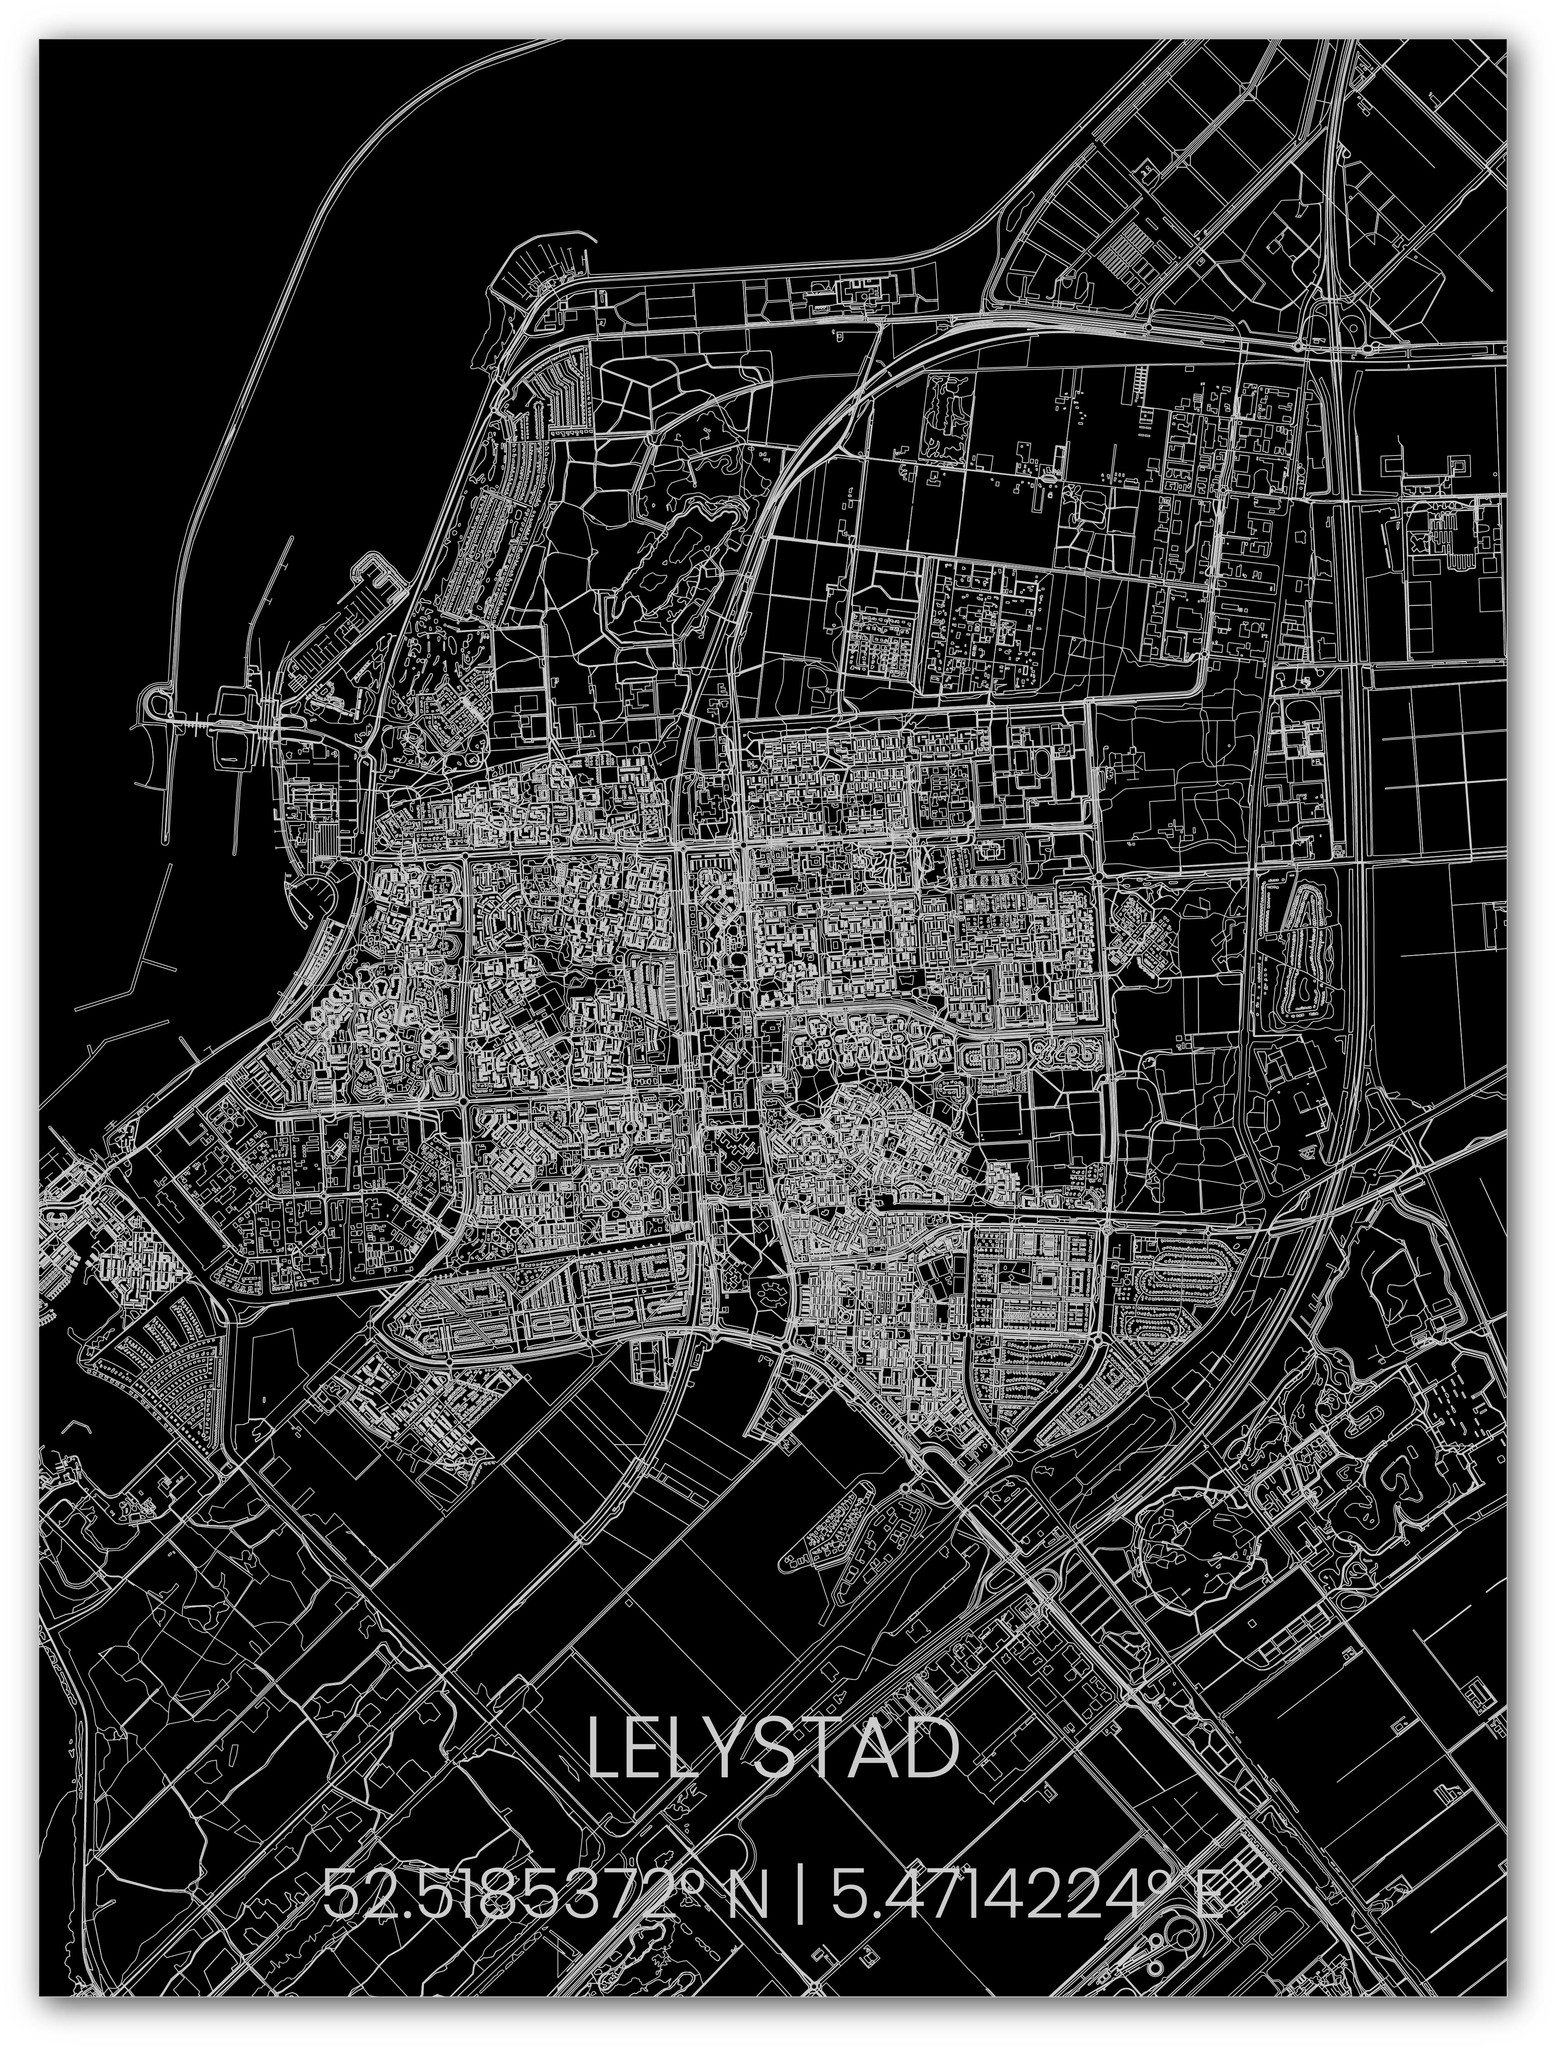 Metalen stadsplattegrond Lelystad-1